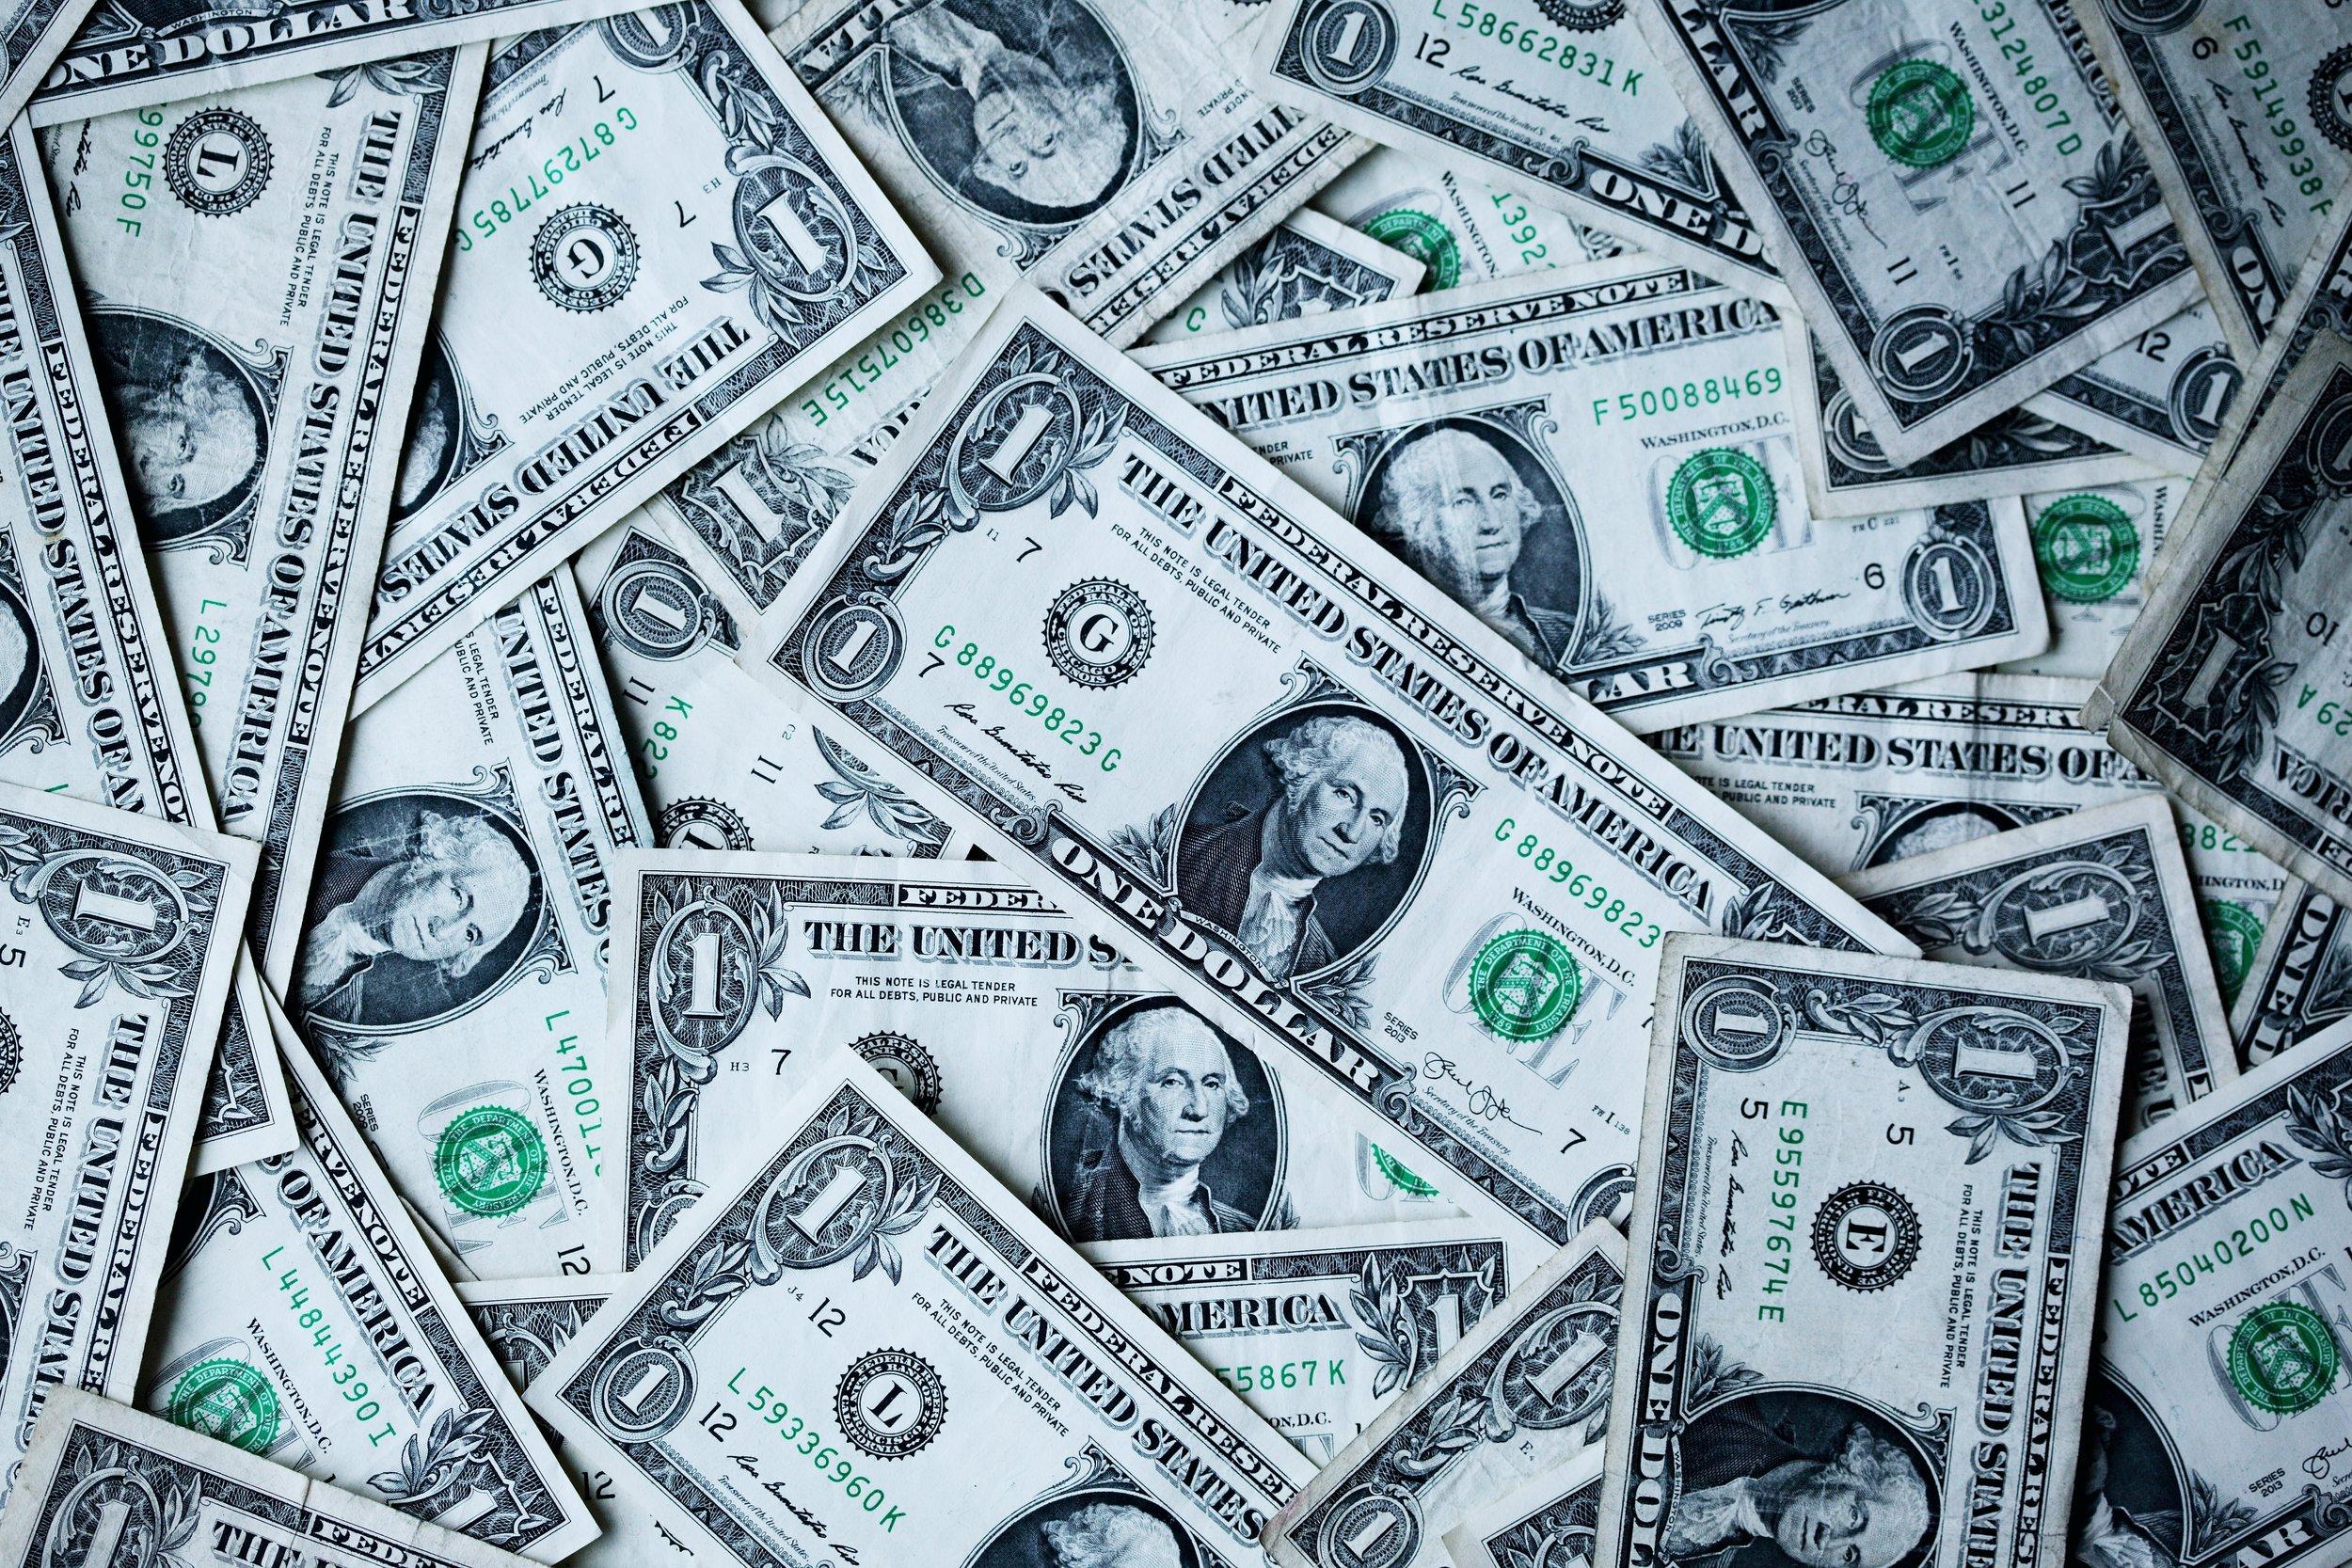 I still live paycheck to paycheck. -